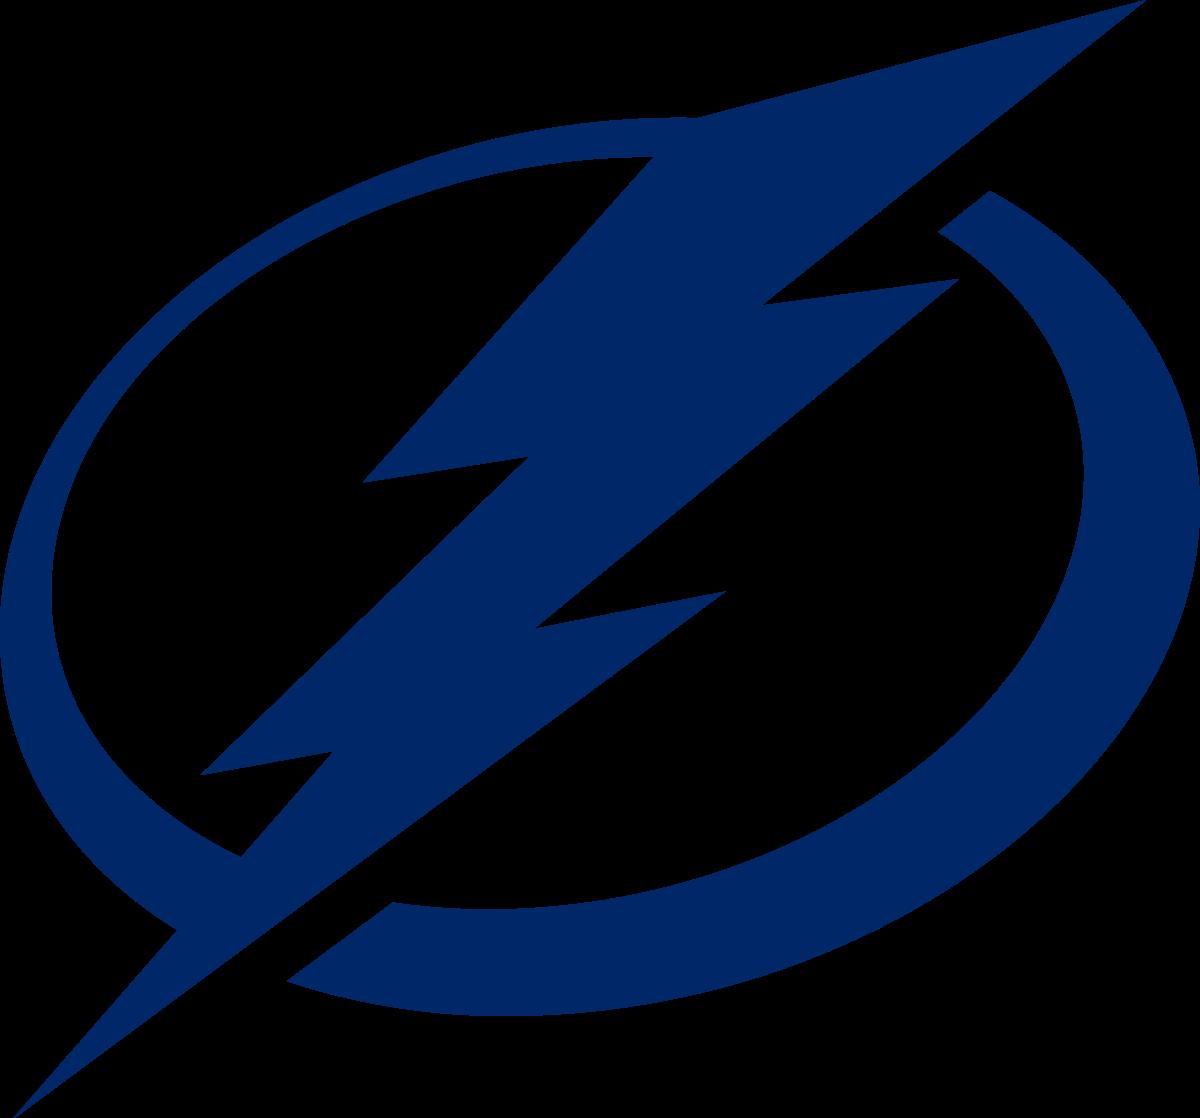 Tampa Bay lightning kepsar 47 brand logo